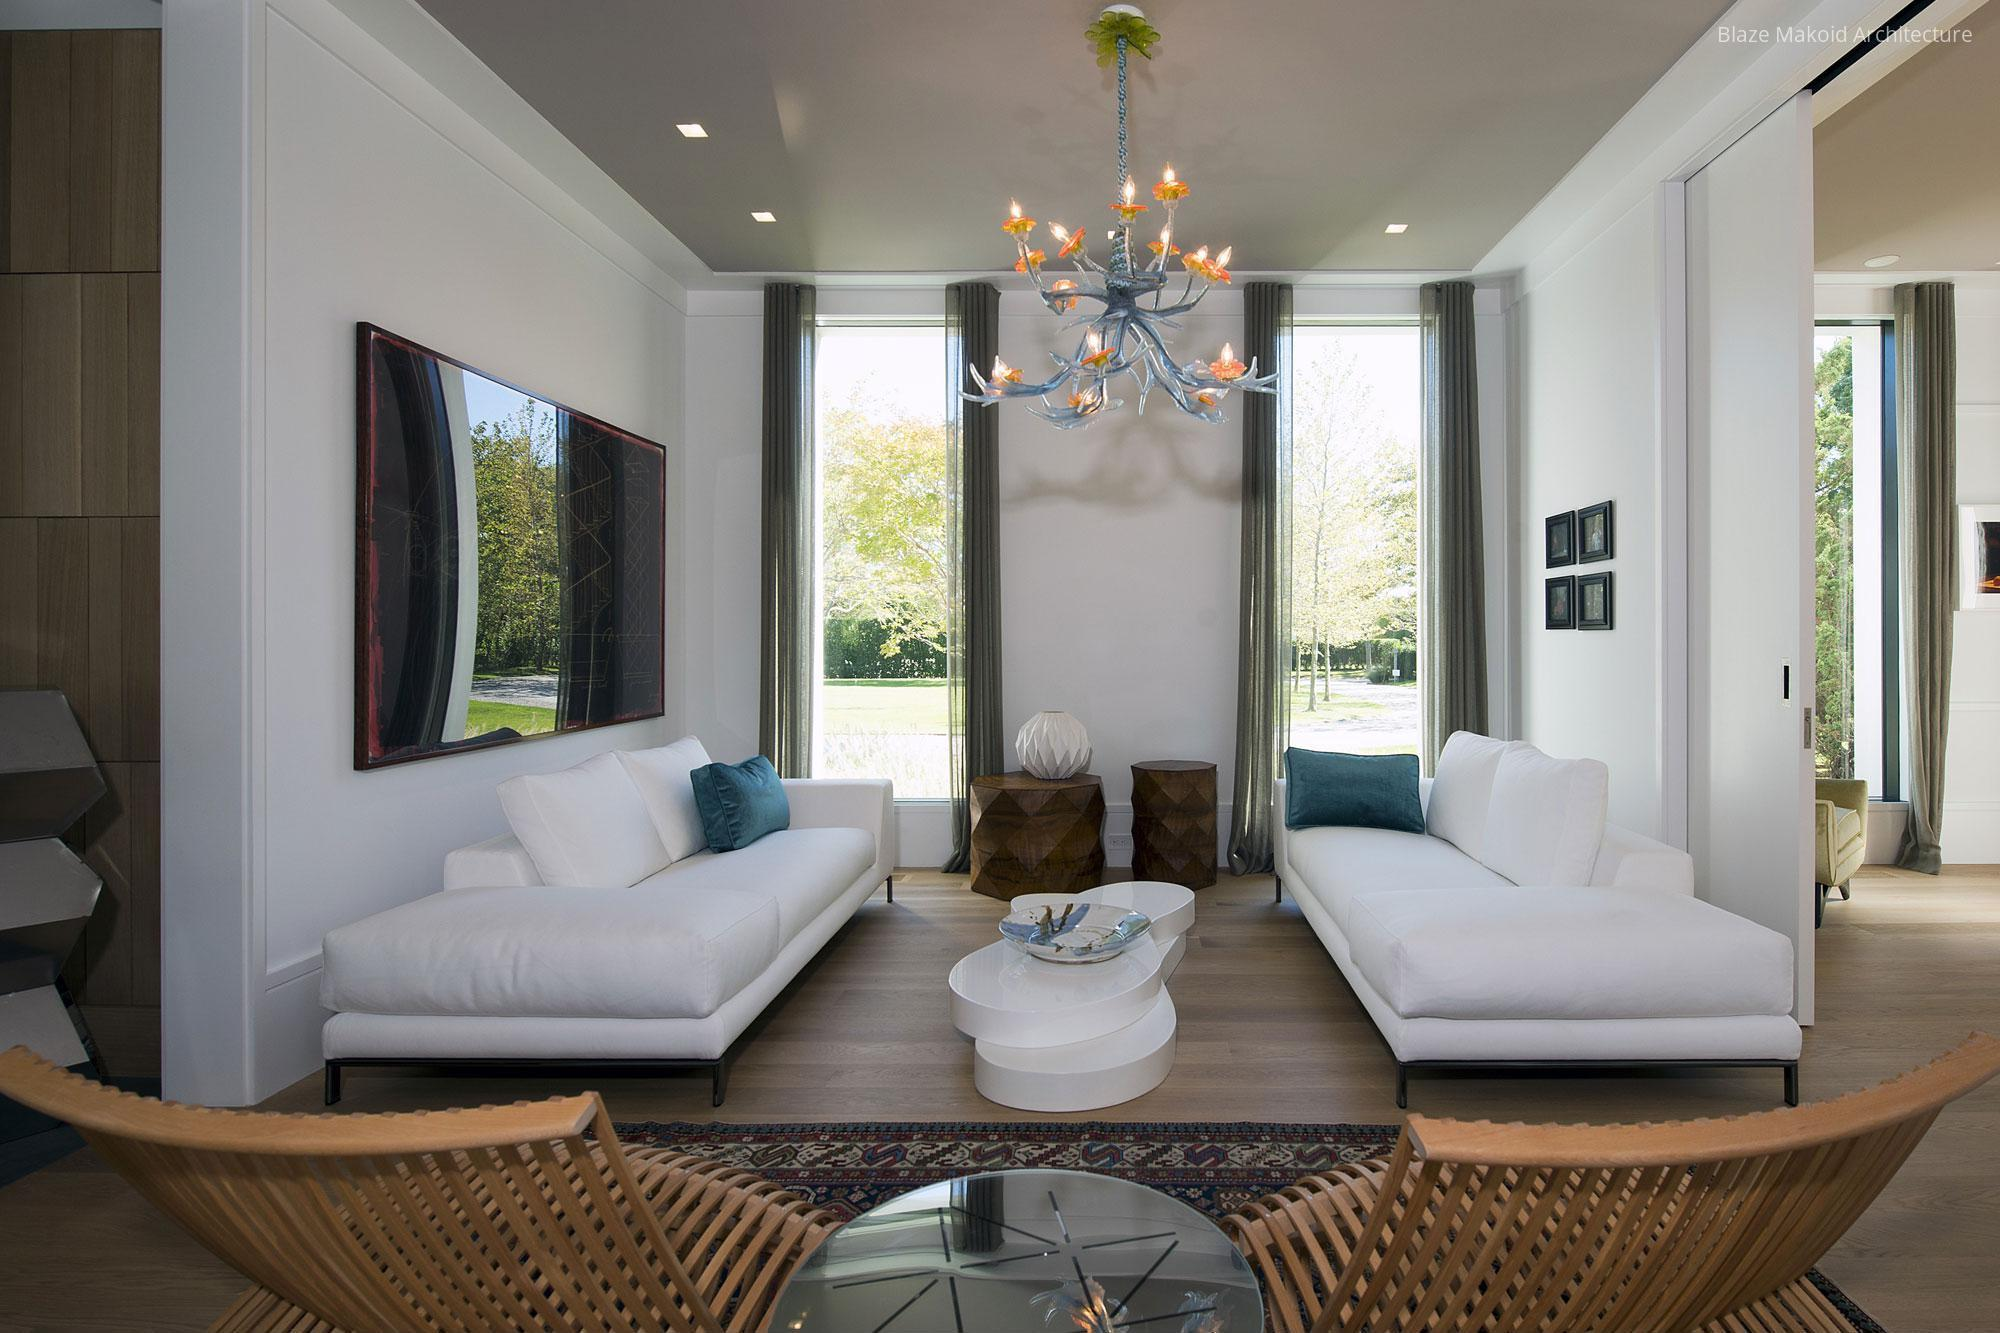 Fehér kanapé // HOMEINFO.hu - Inspirációtár